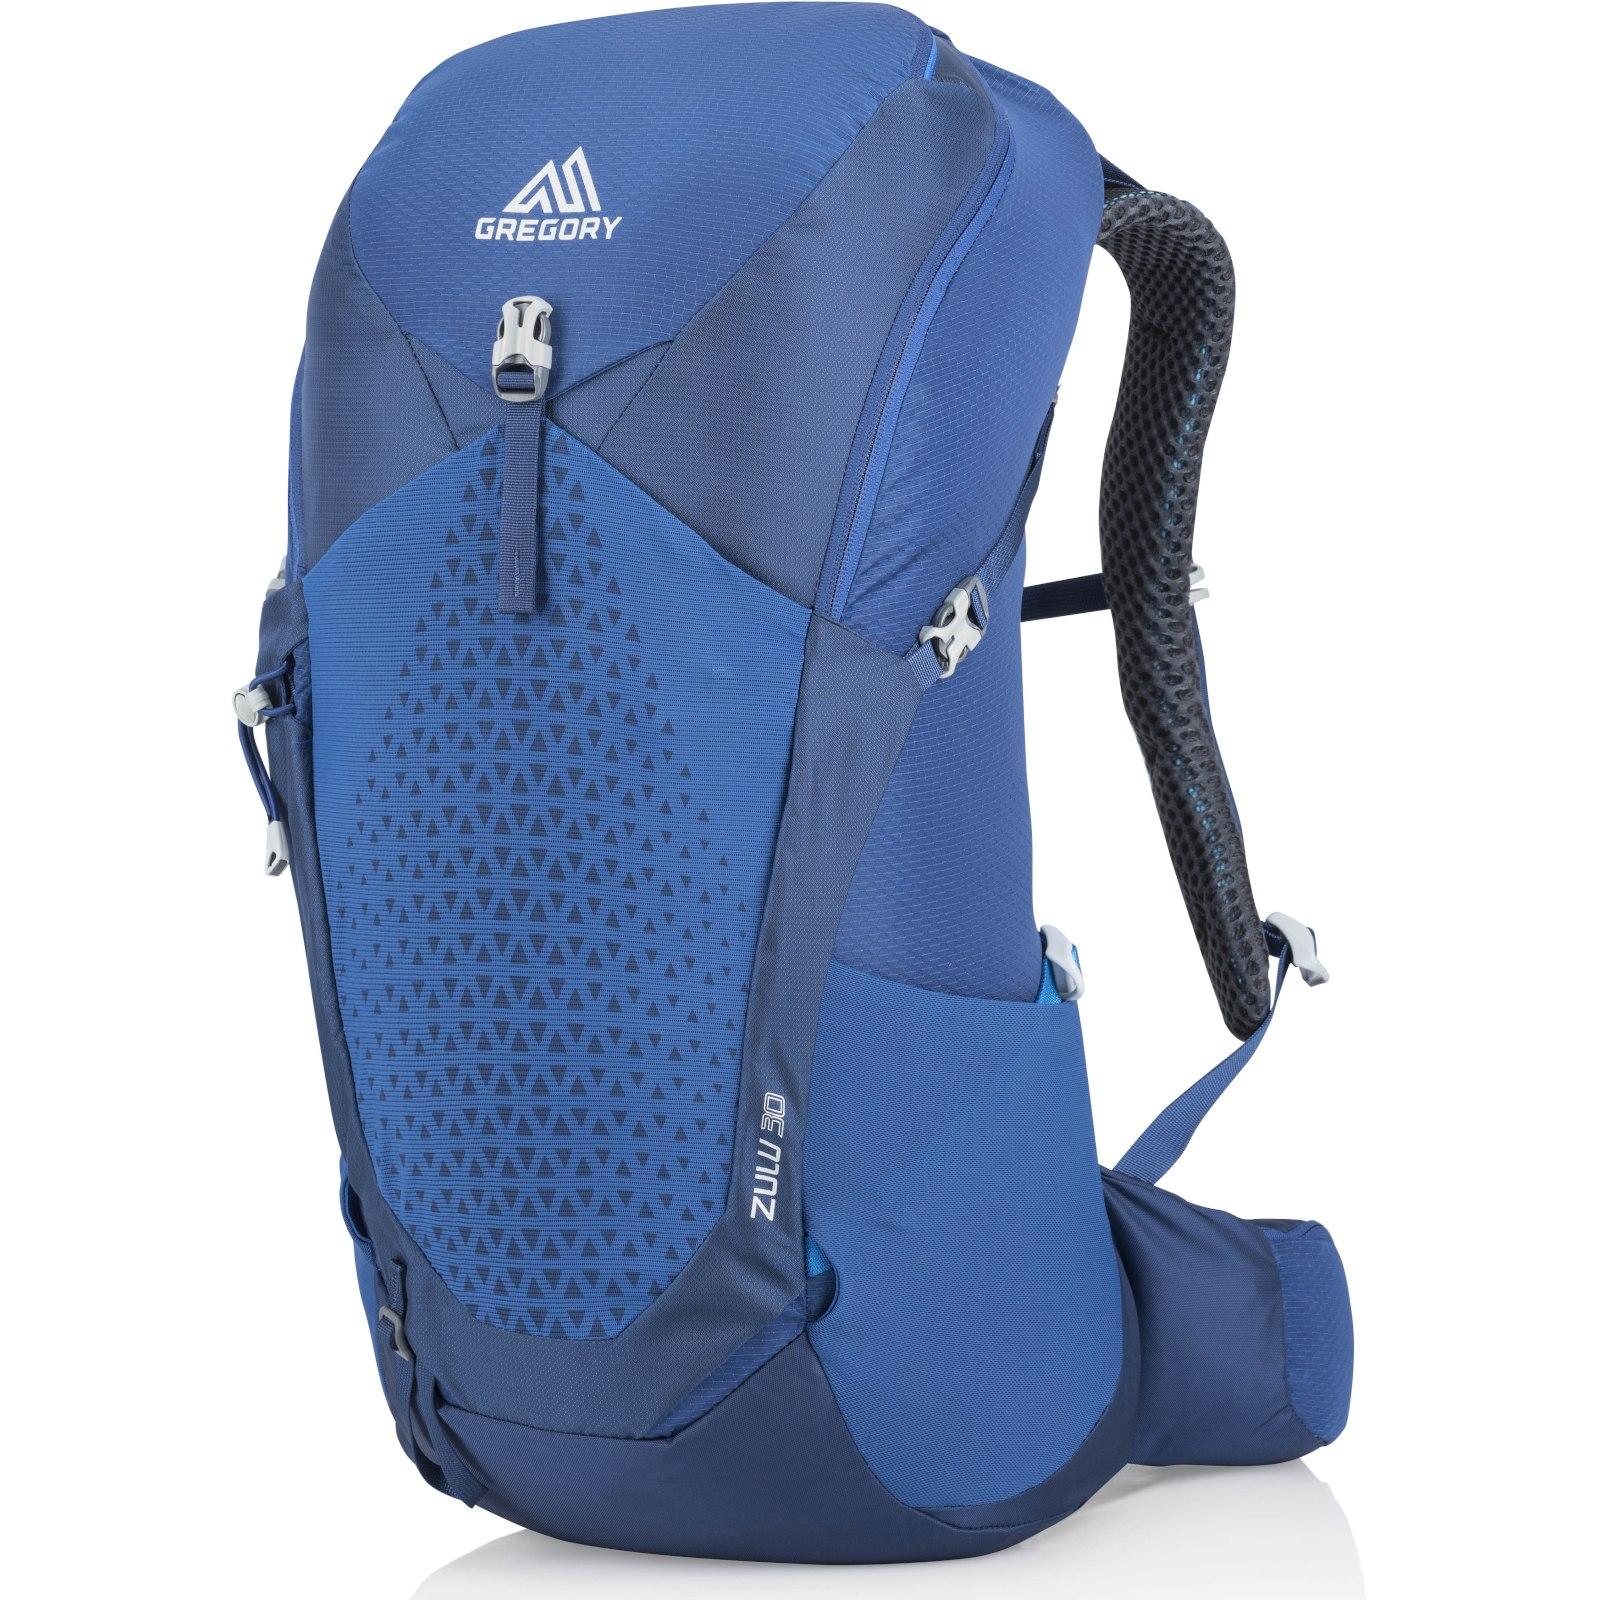 Gregory Zulu 30 Backpack - Empire Blue